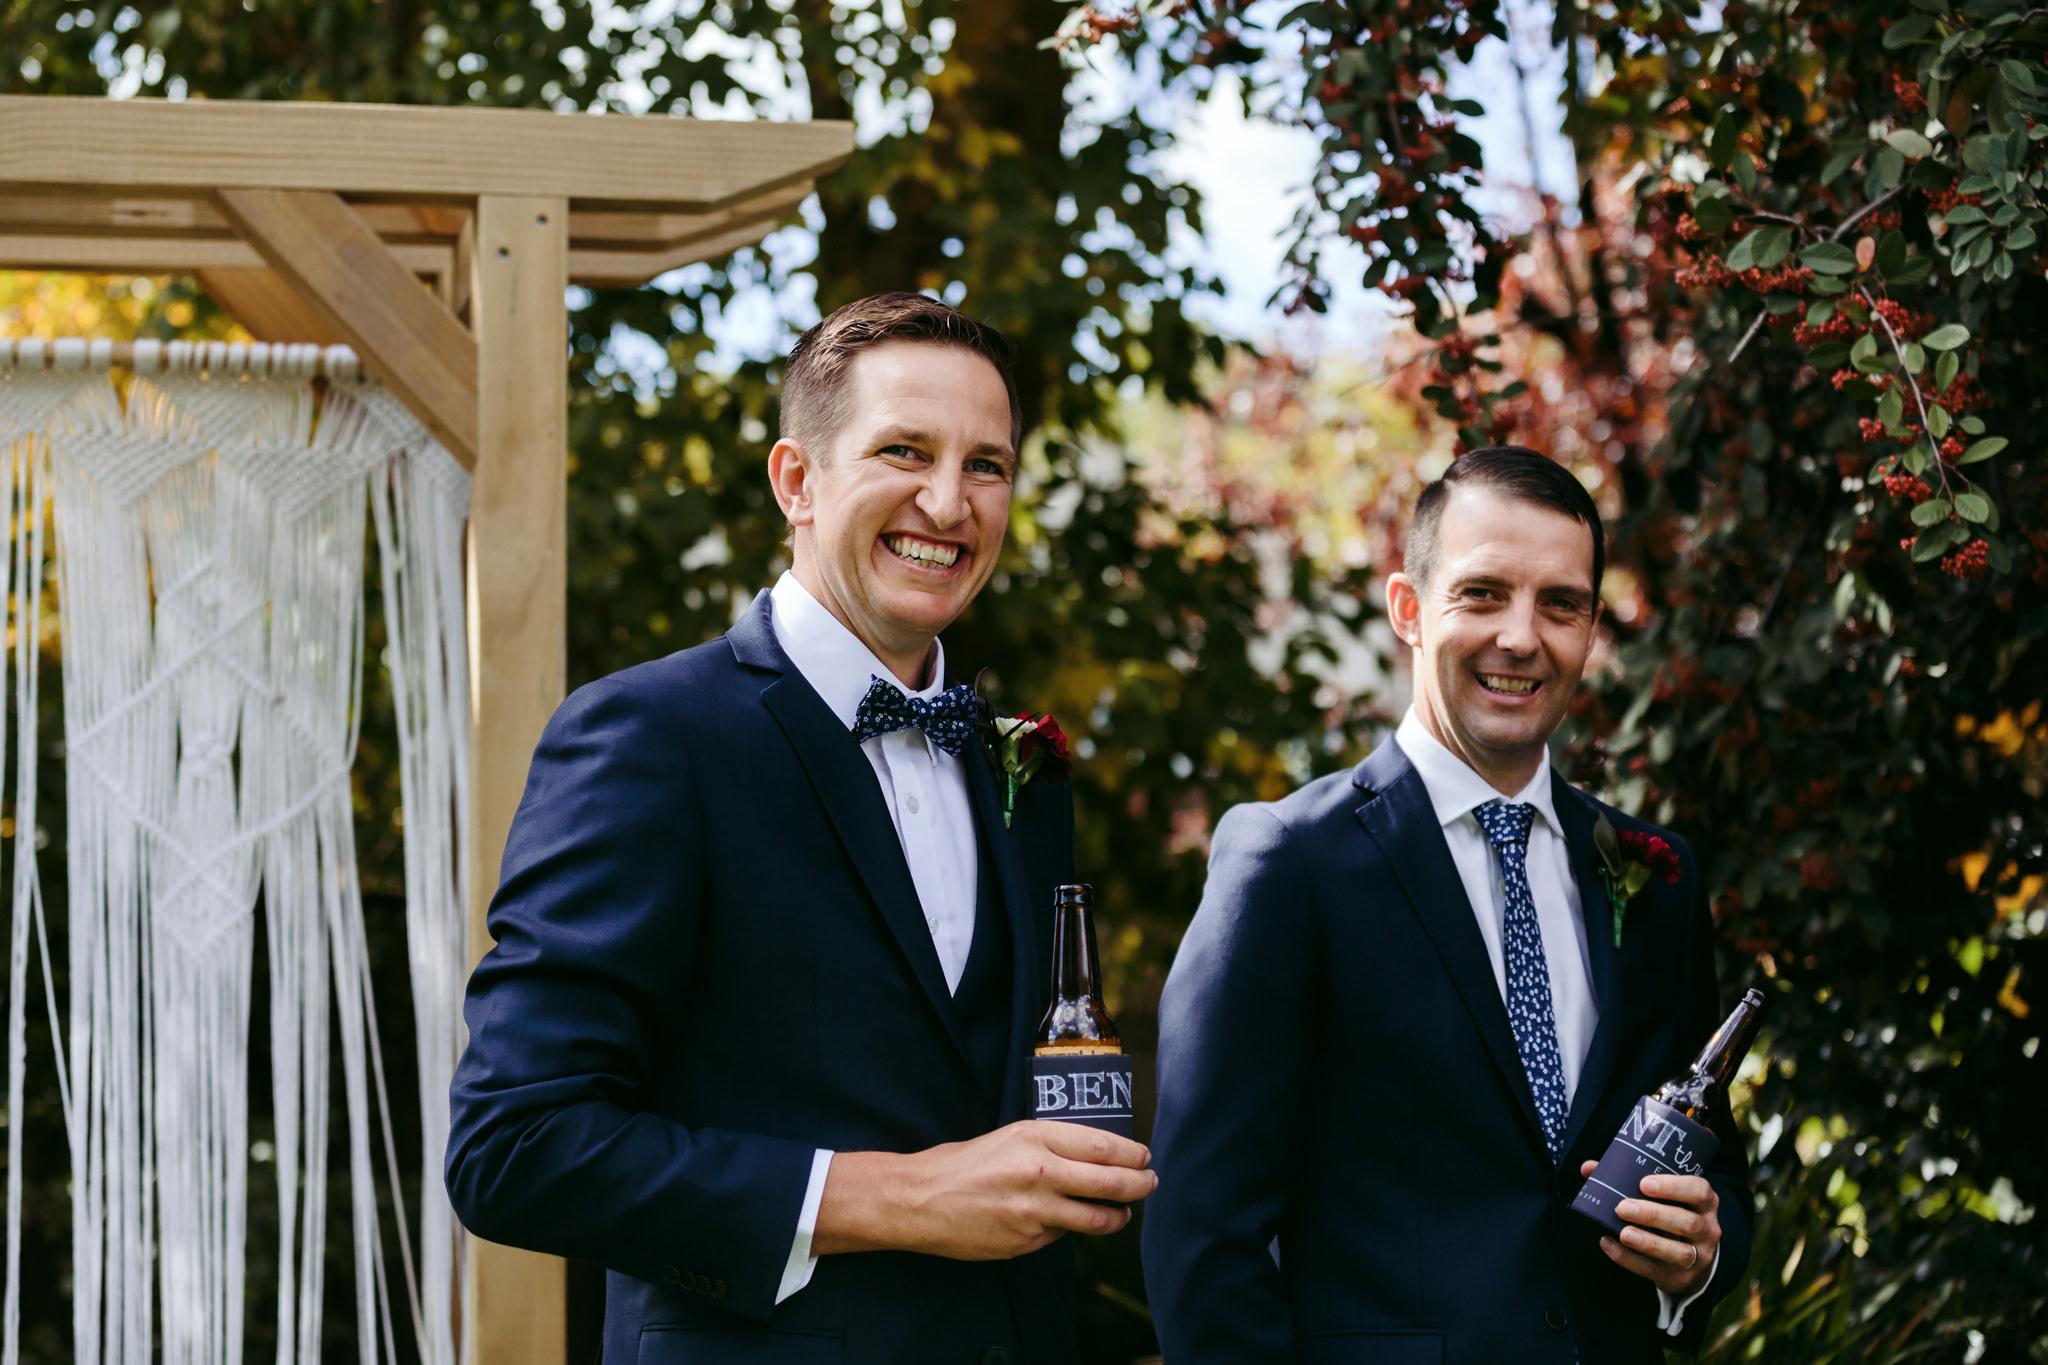 Erin Latimore Mudgee Canberra Wedding Photographer ROSEBANK GUESTHOUSE OLD THEATRE TONIC MILLTHORPE_124.JPG